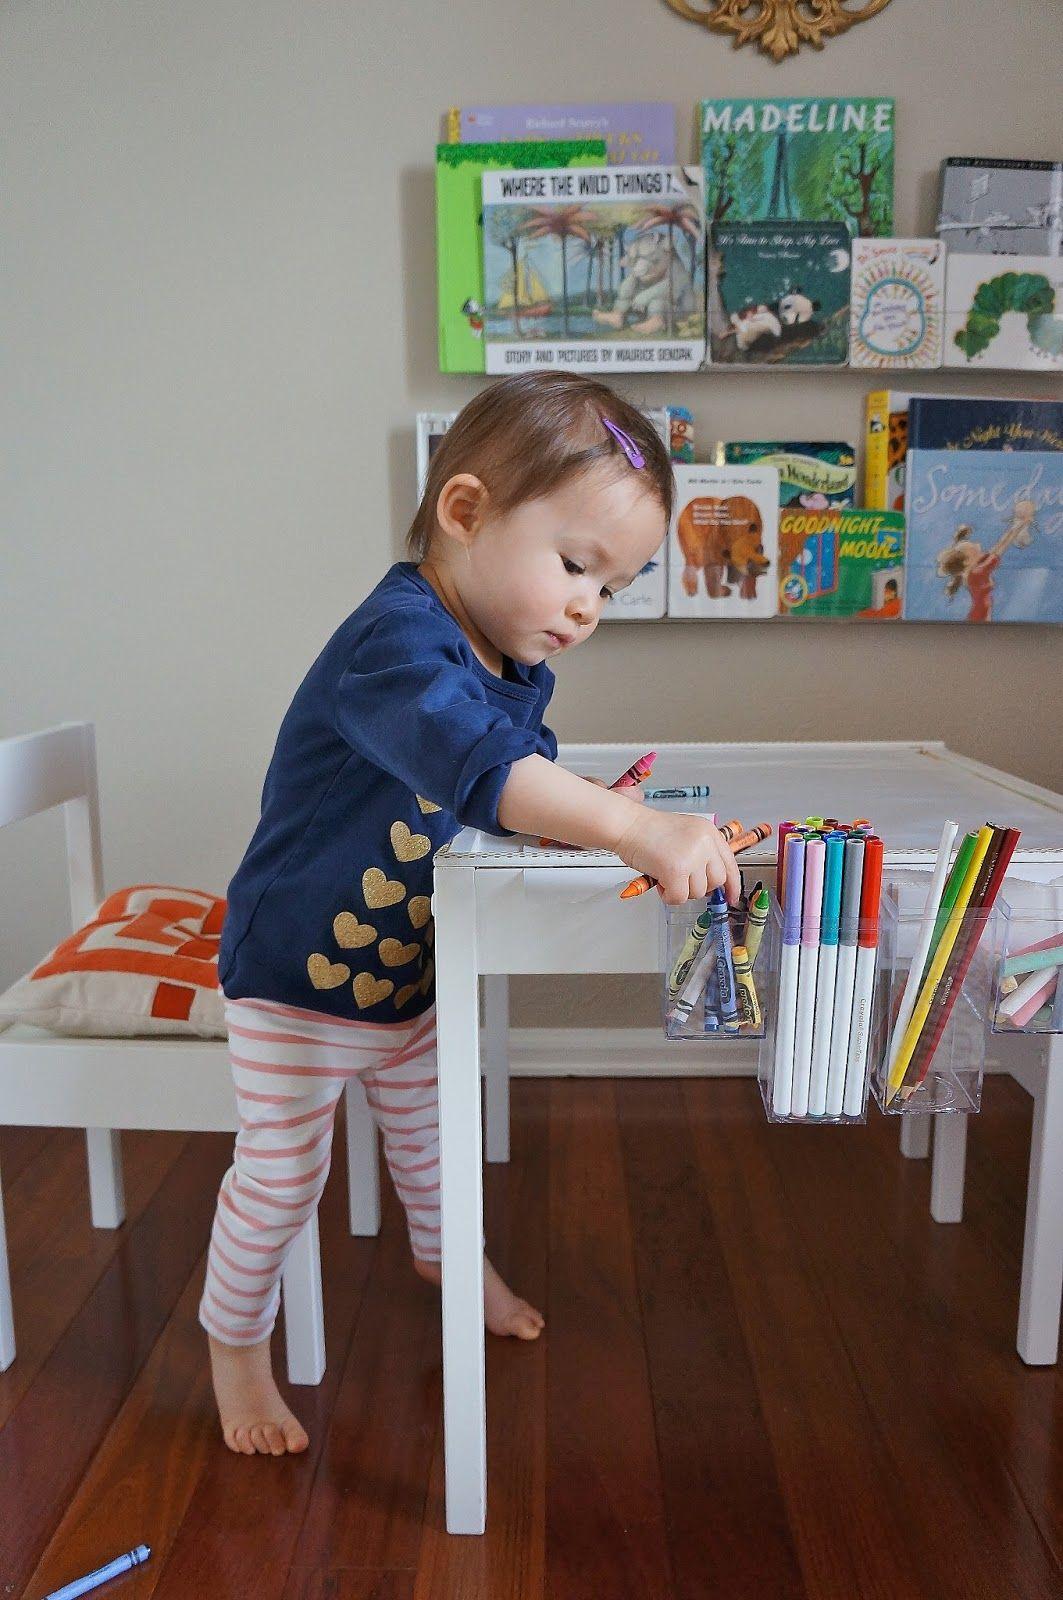 because our kids deserve personalized furniture ikea idee pinterest kinderzimmer. Black Bedroom Furniture Sets. Home Design Ideas